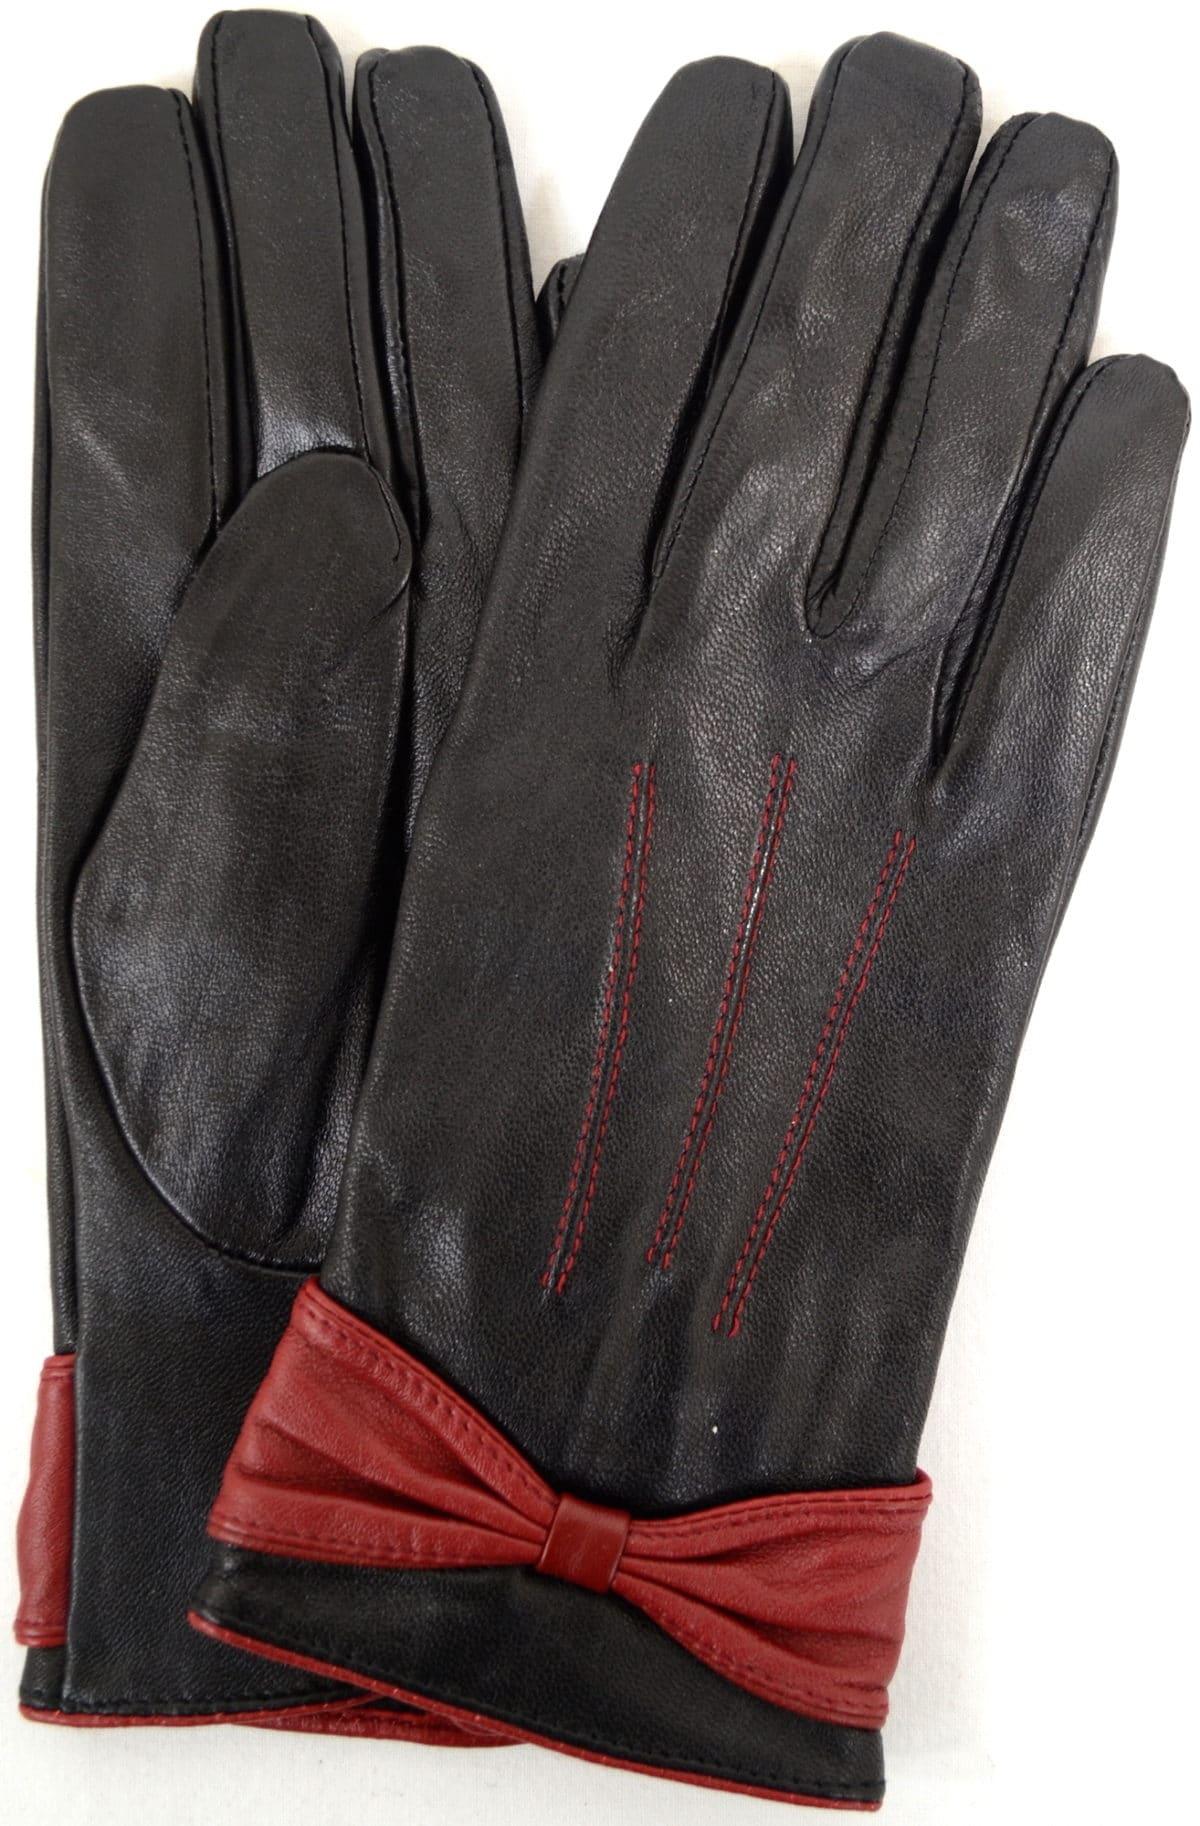 0517a9941ff7 Ladies Leather Fleece Gloves - Red - Elle - SNUGRUGS